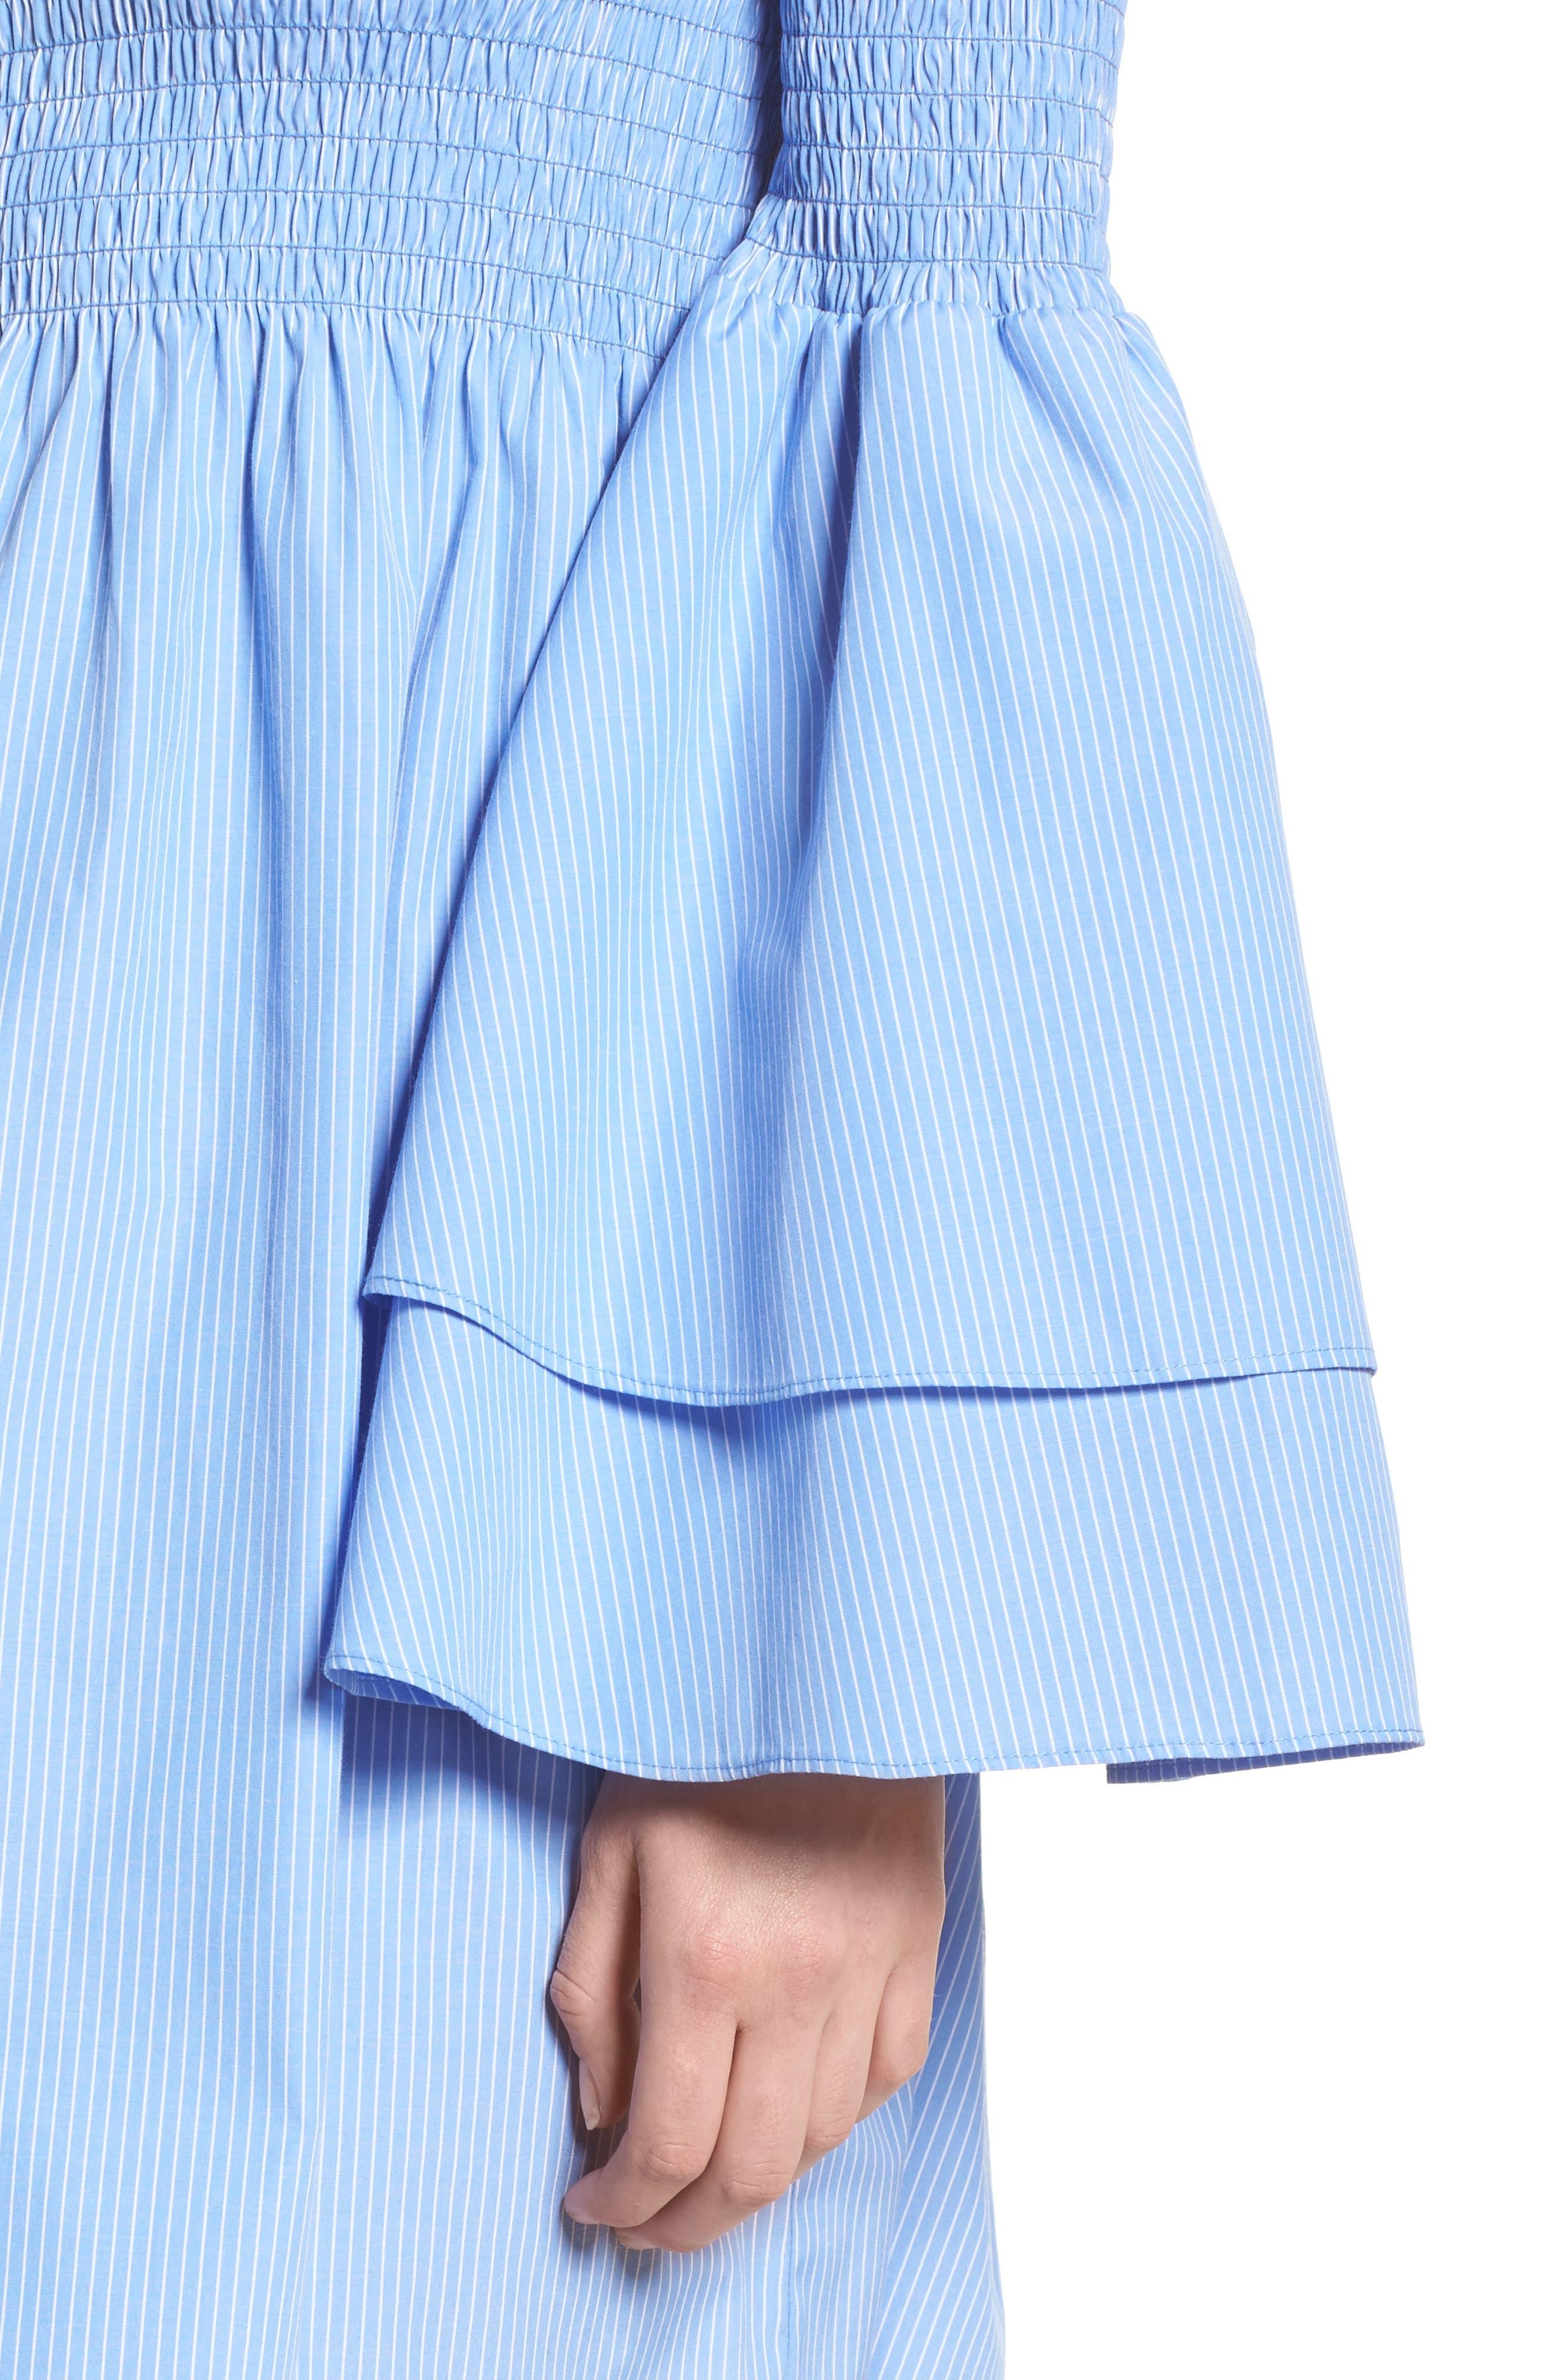 Smocked Off the Shoulder Bell Sleeve Dress,                             Alternate thumbnail 4, color,                             Blue/ White Stripe